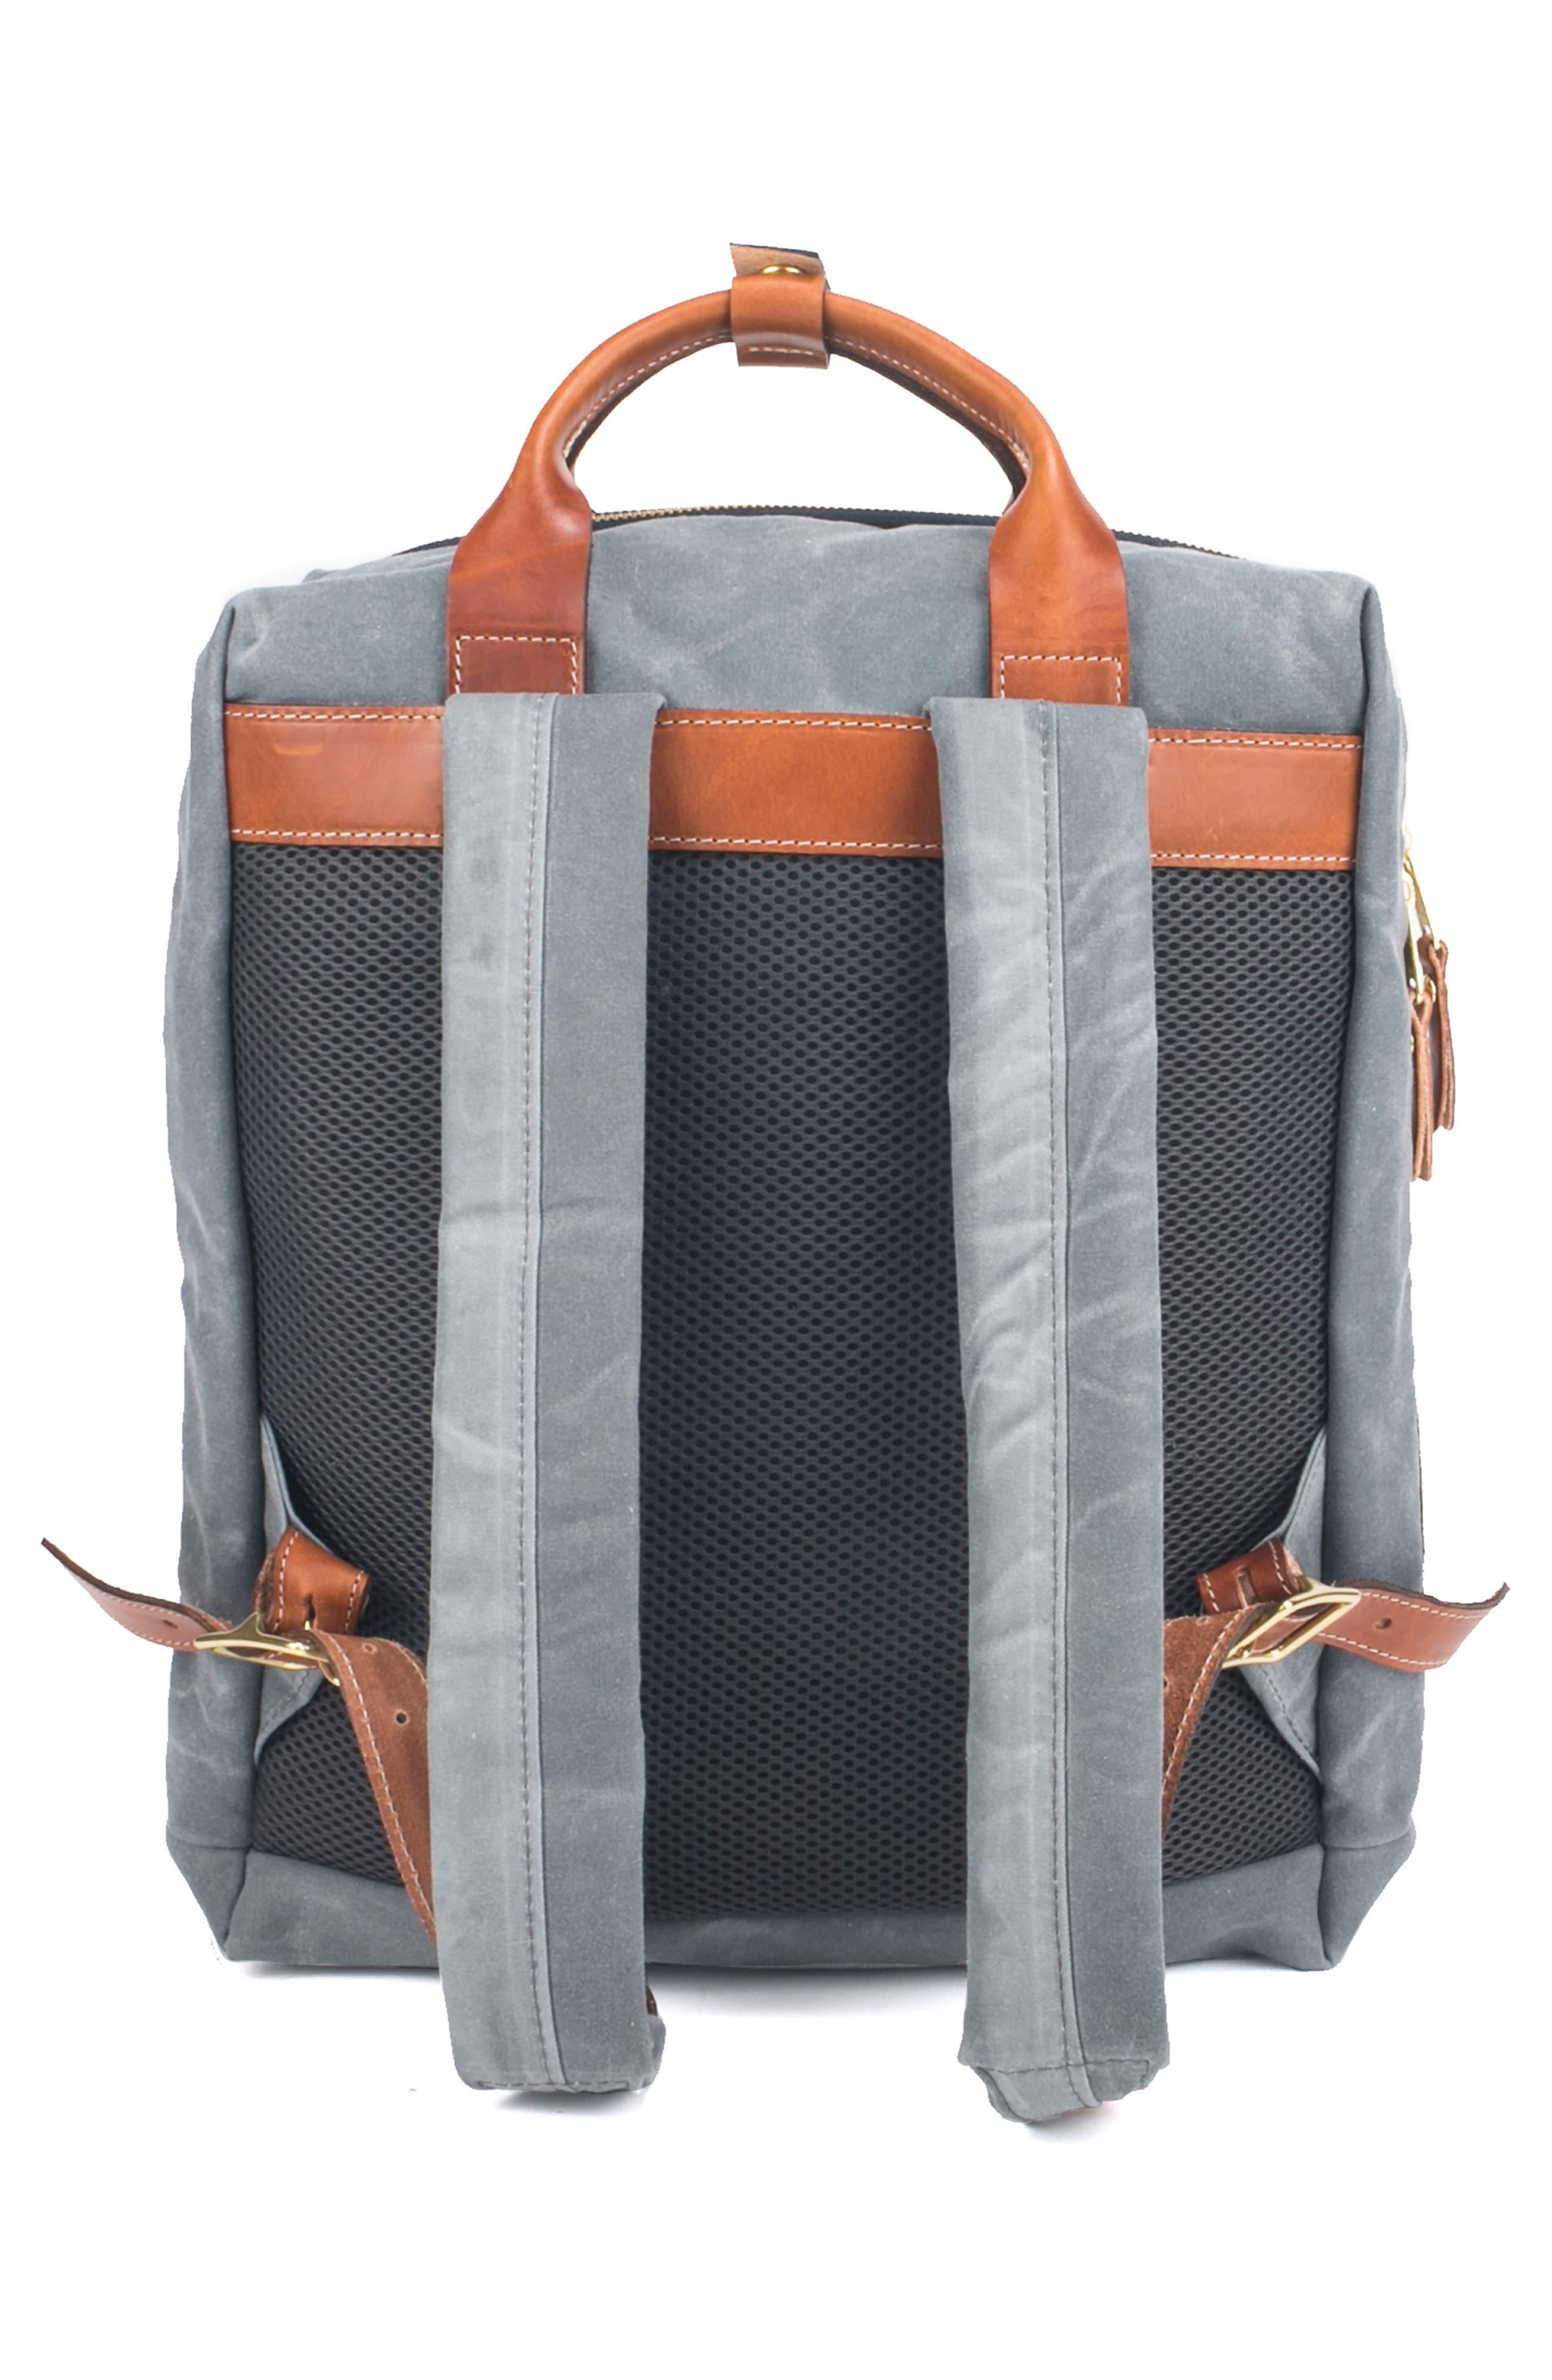 Metro Backpack,                             Alternate thumbnail 2, color,                             Charcoal